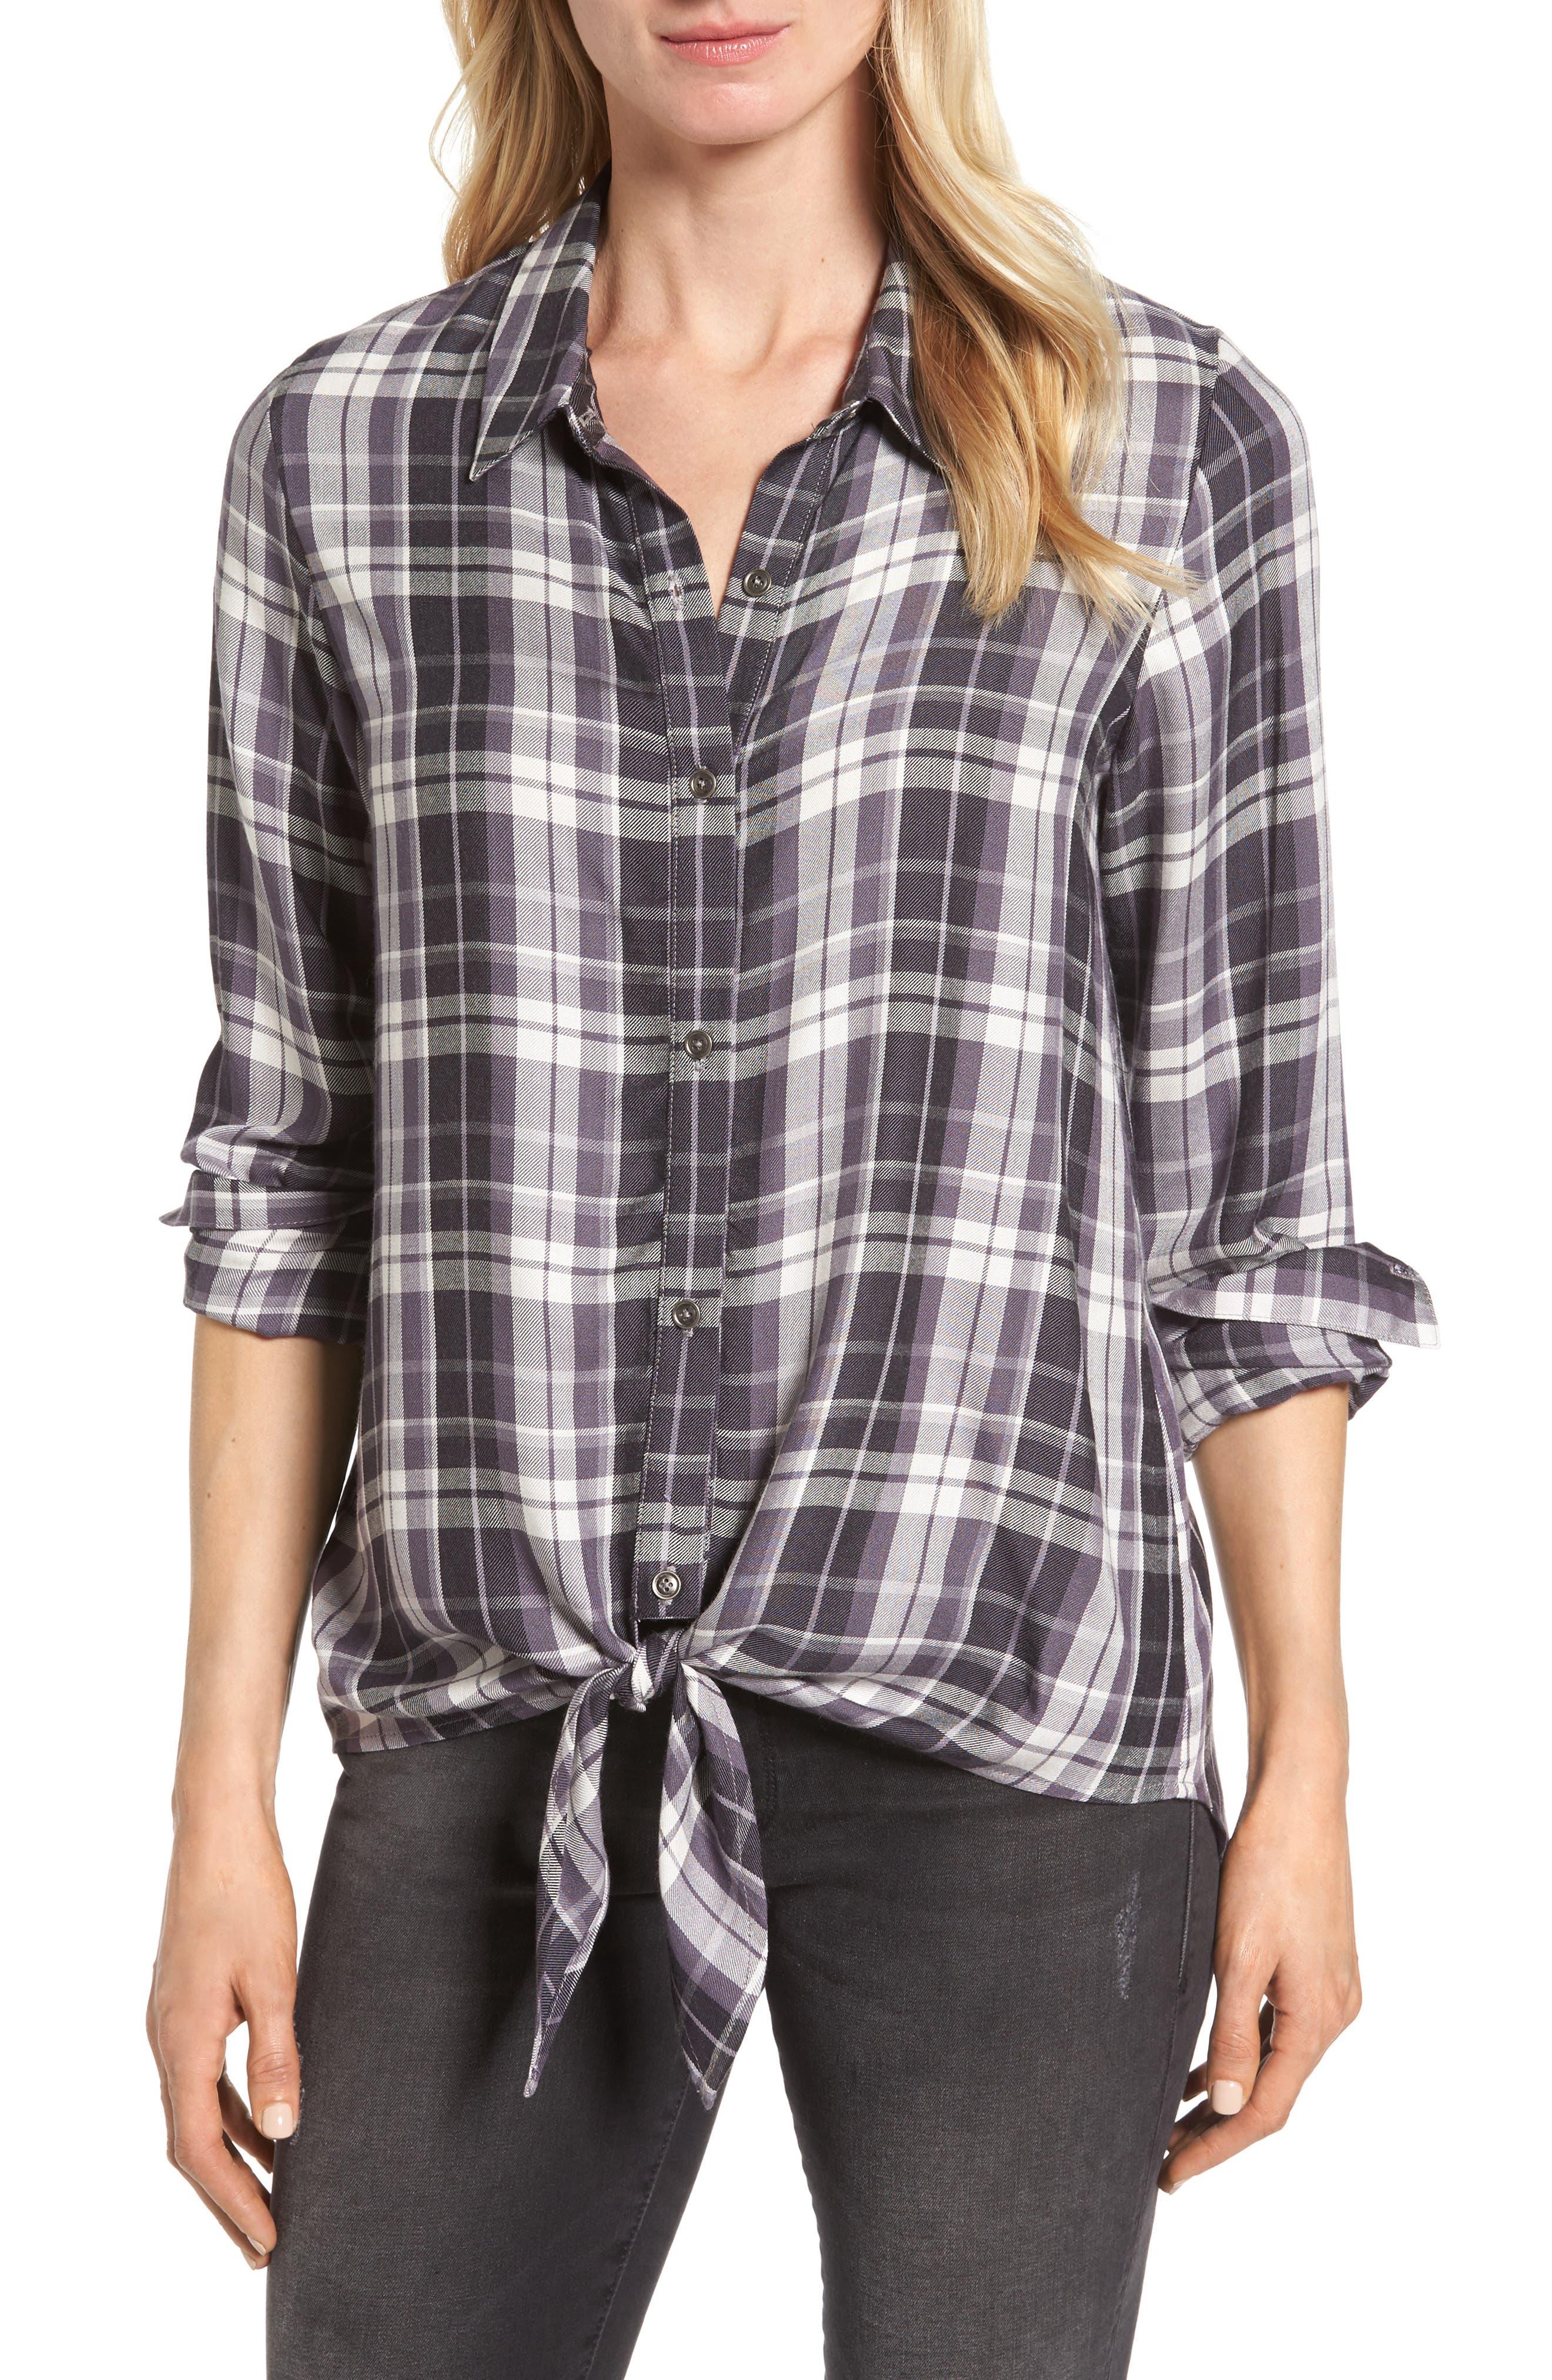 Alternate Image 1 Selected - Bobeau Tie Front Plaid Shirt